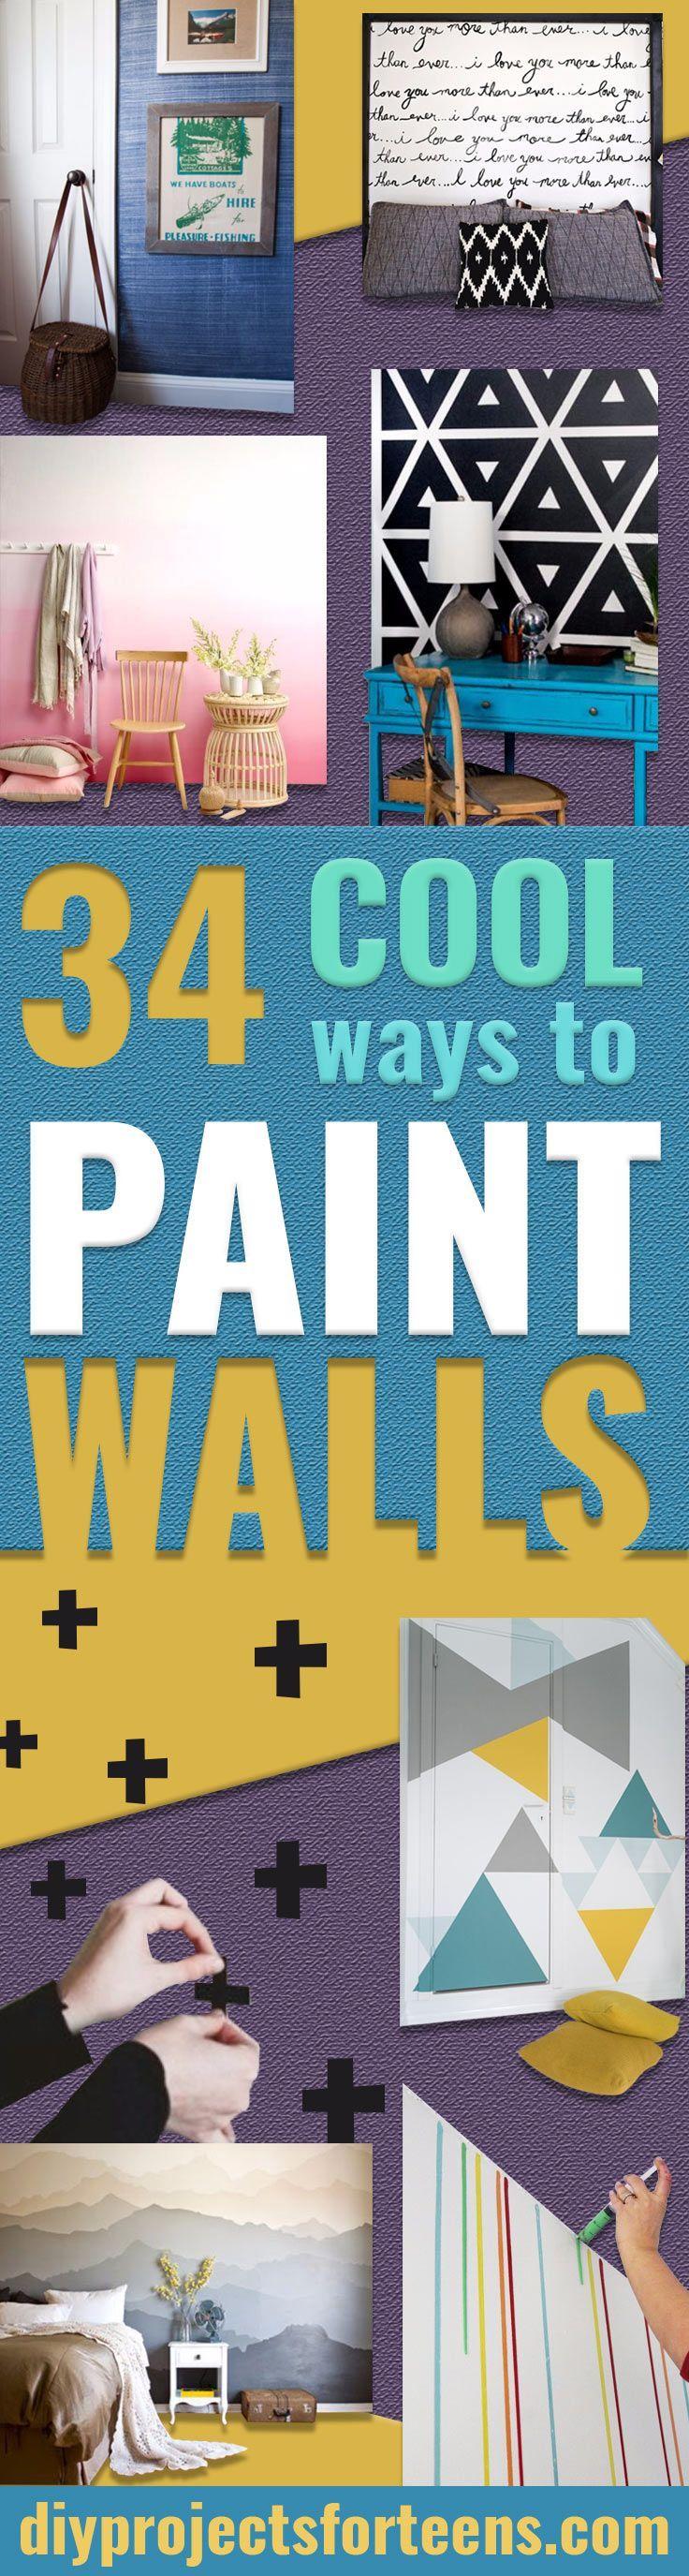 34 cool ways to paint walls designs for living roombedroom kidskids roomskids